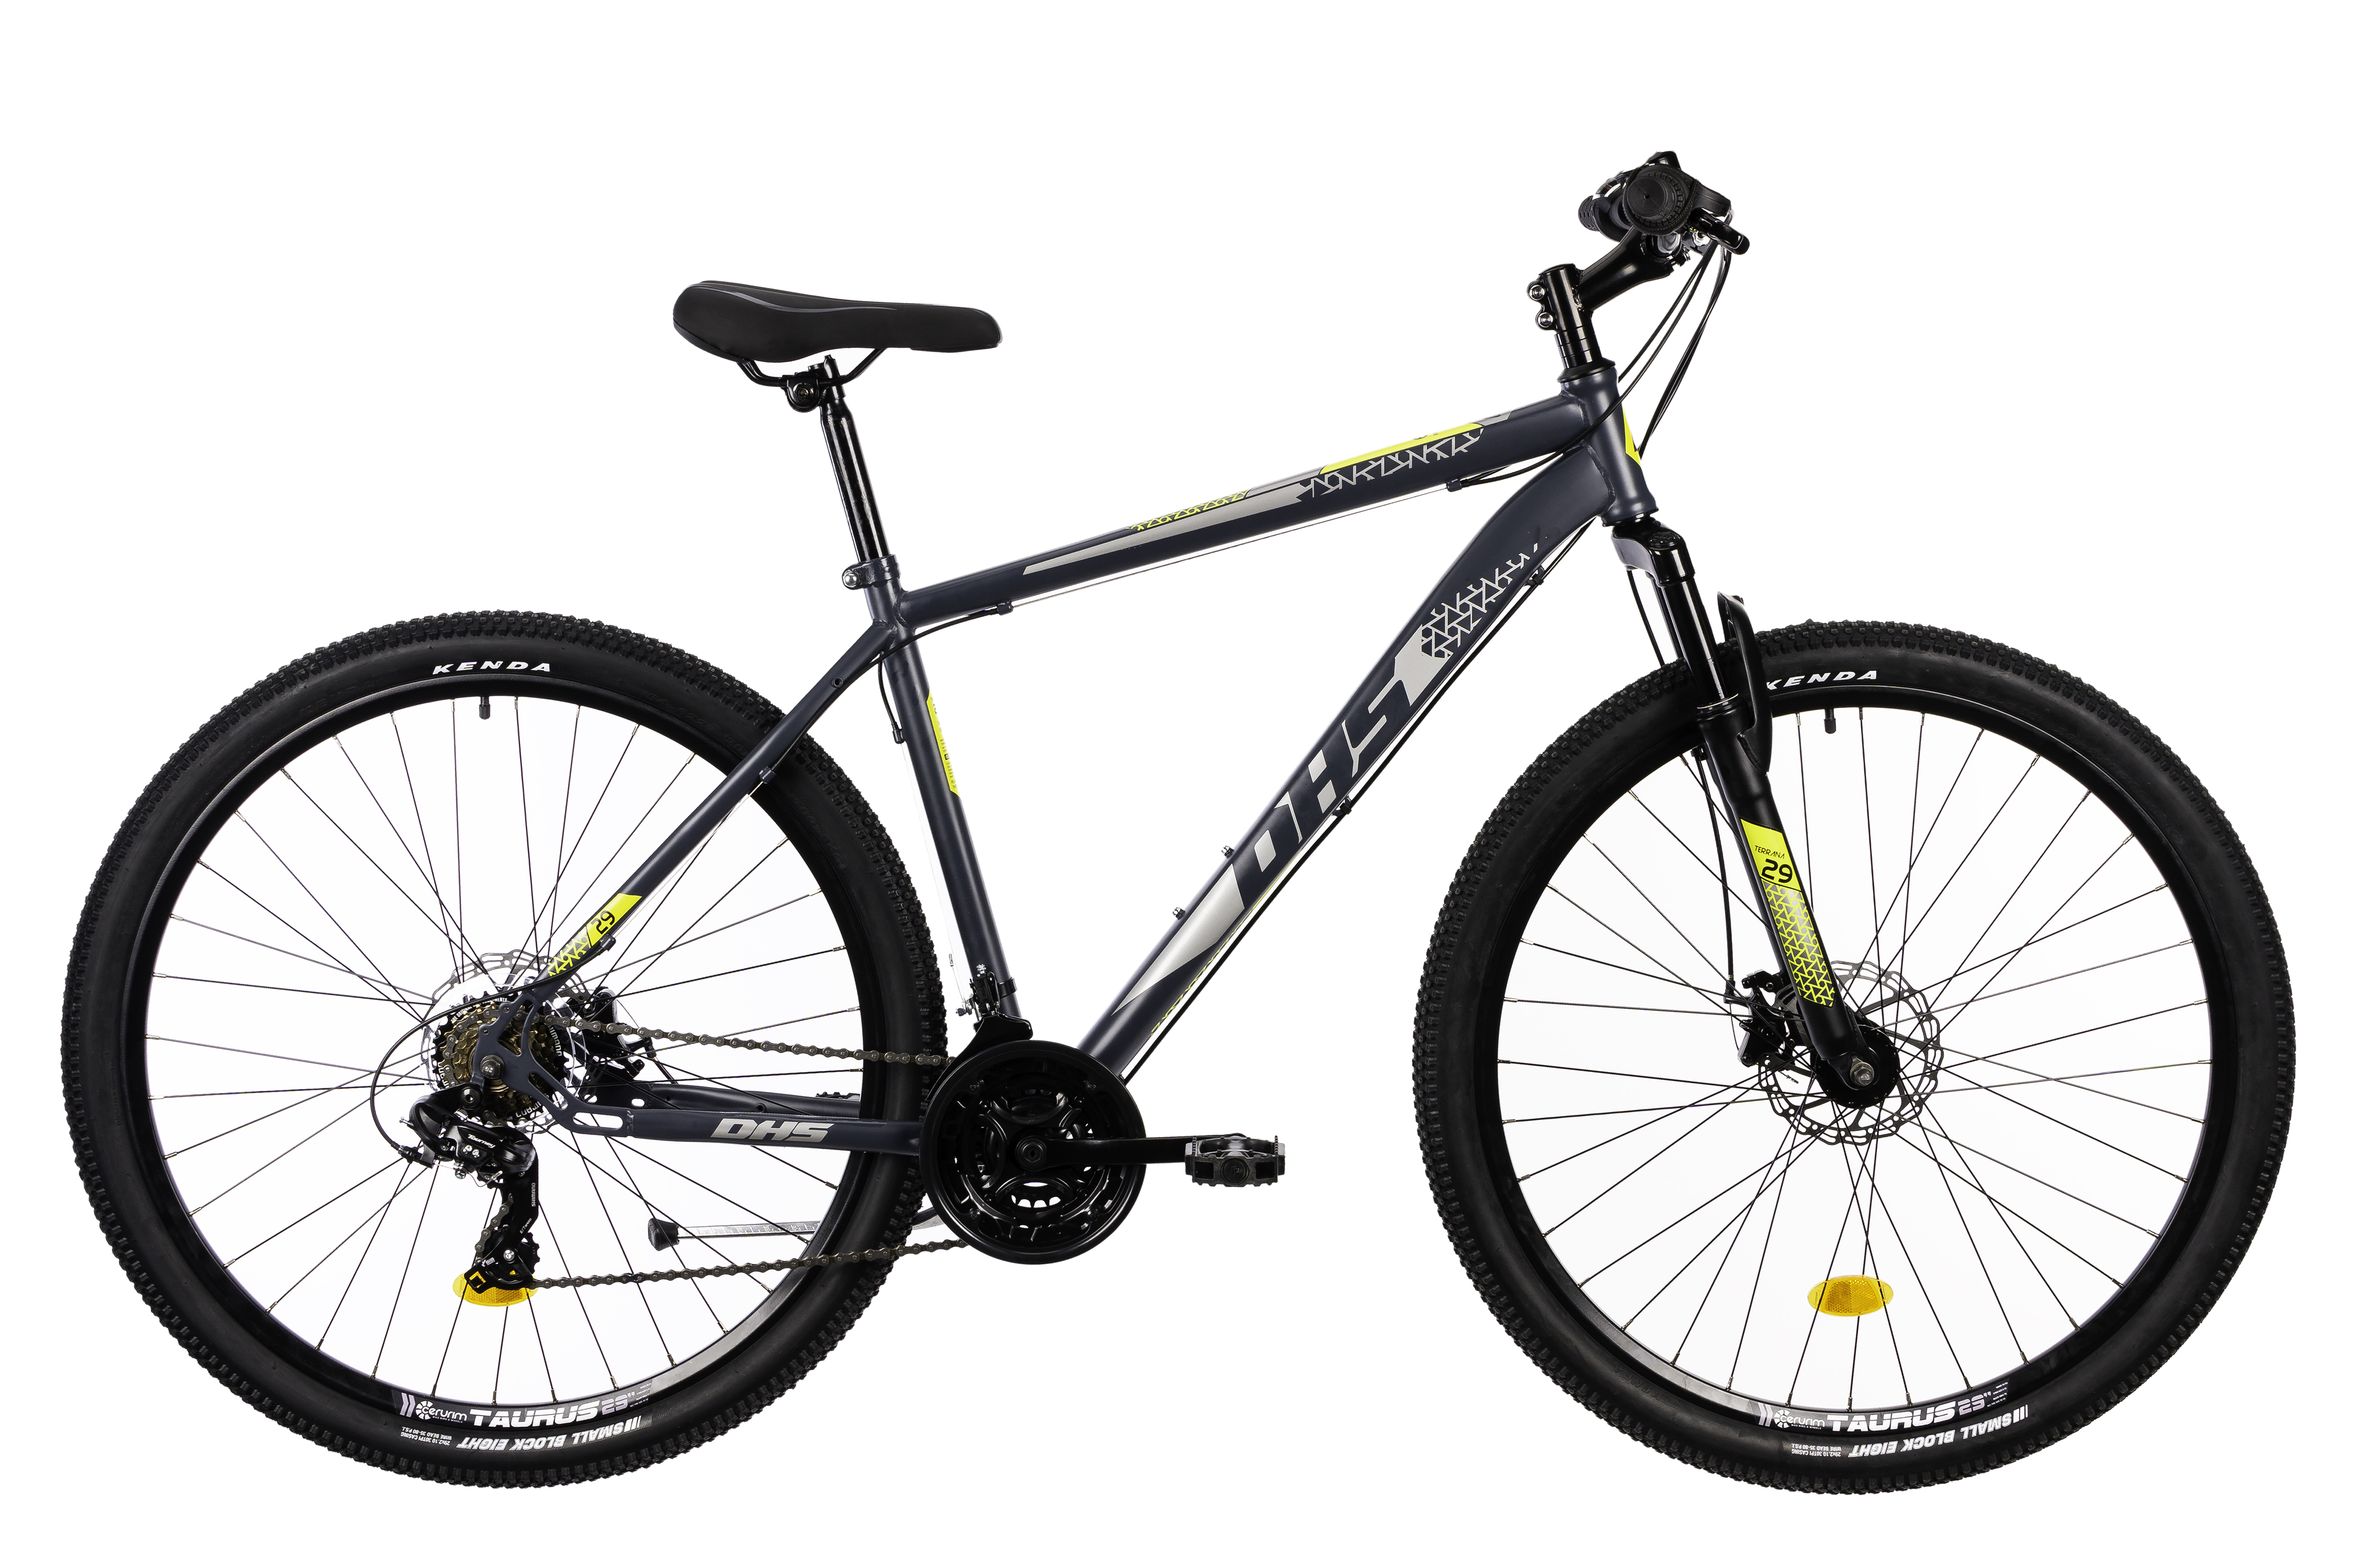 Bicicleta Mtb Terrana 2905 - 29 Inch, M, Gri [0]